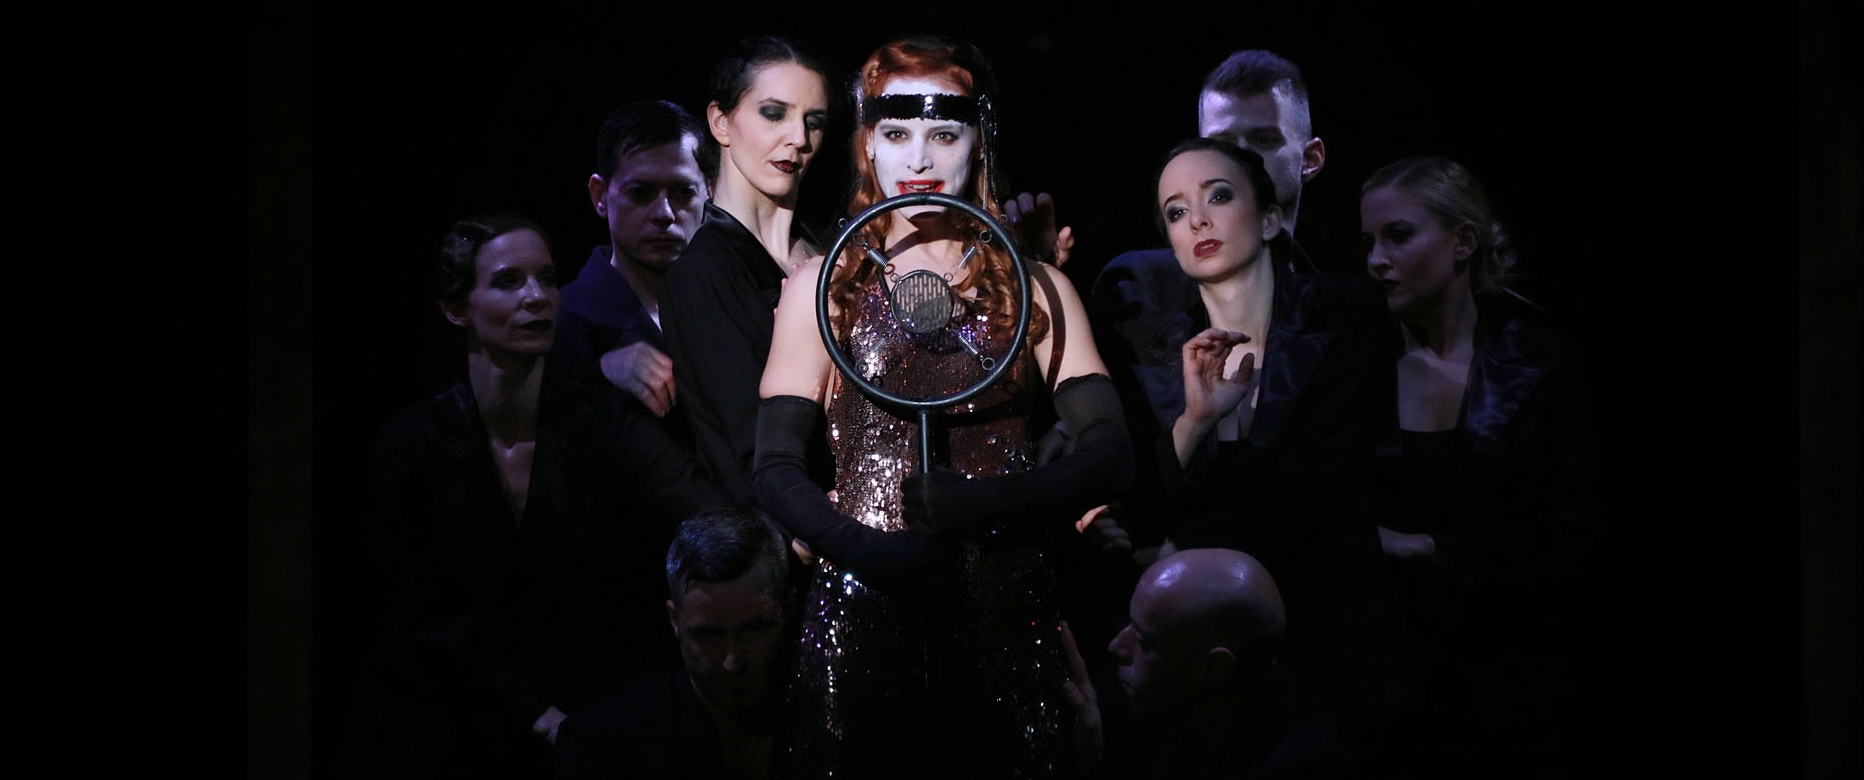 cabaret-eloadasfotok-16484.jpg